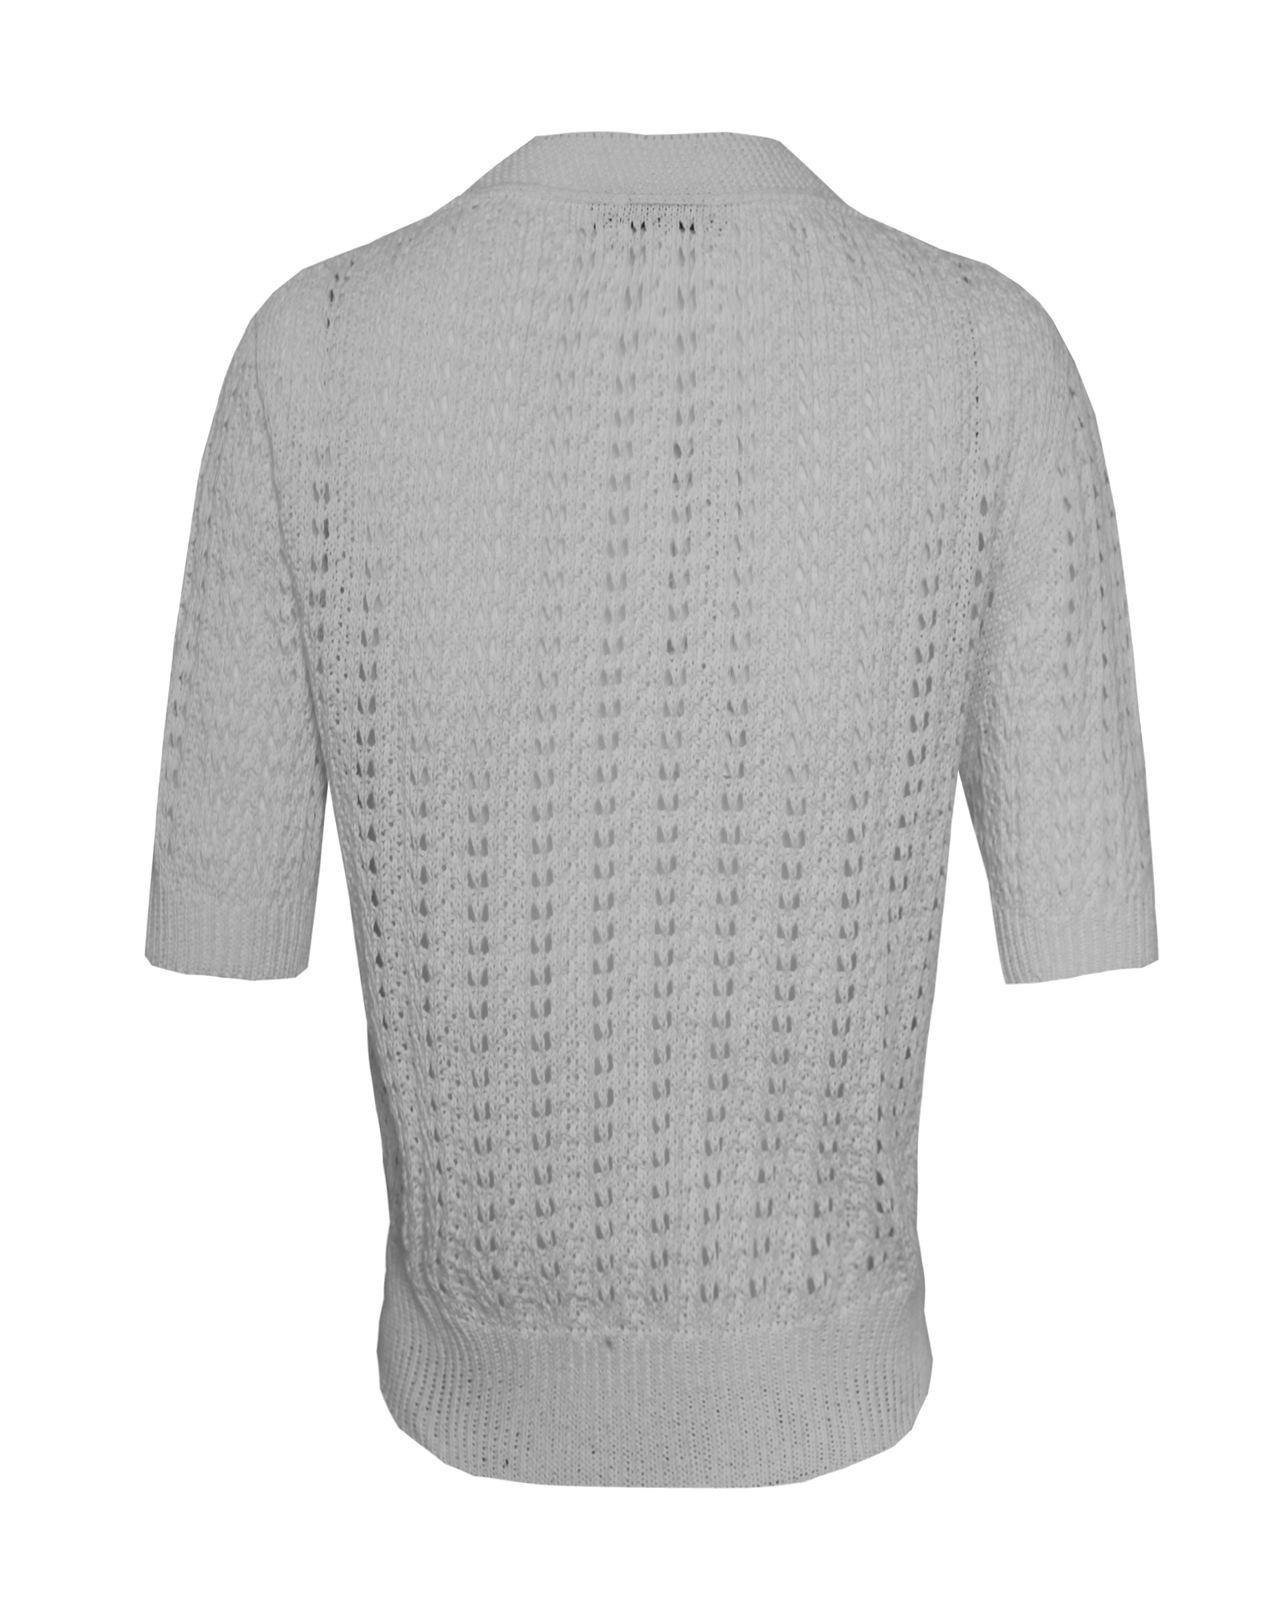 Mesdames-crochet-tricote-pour-femme-manches-courtes-hausser-brooched-cardigan-crop-top-8-14 miniature 15